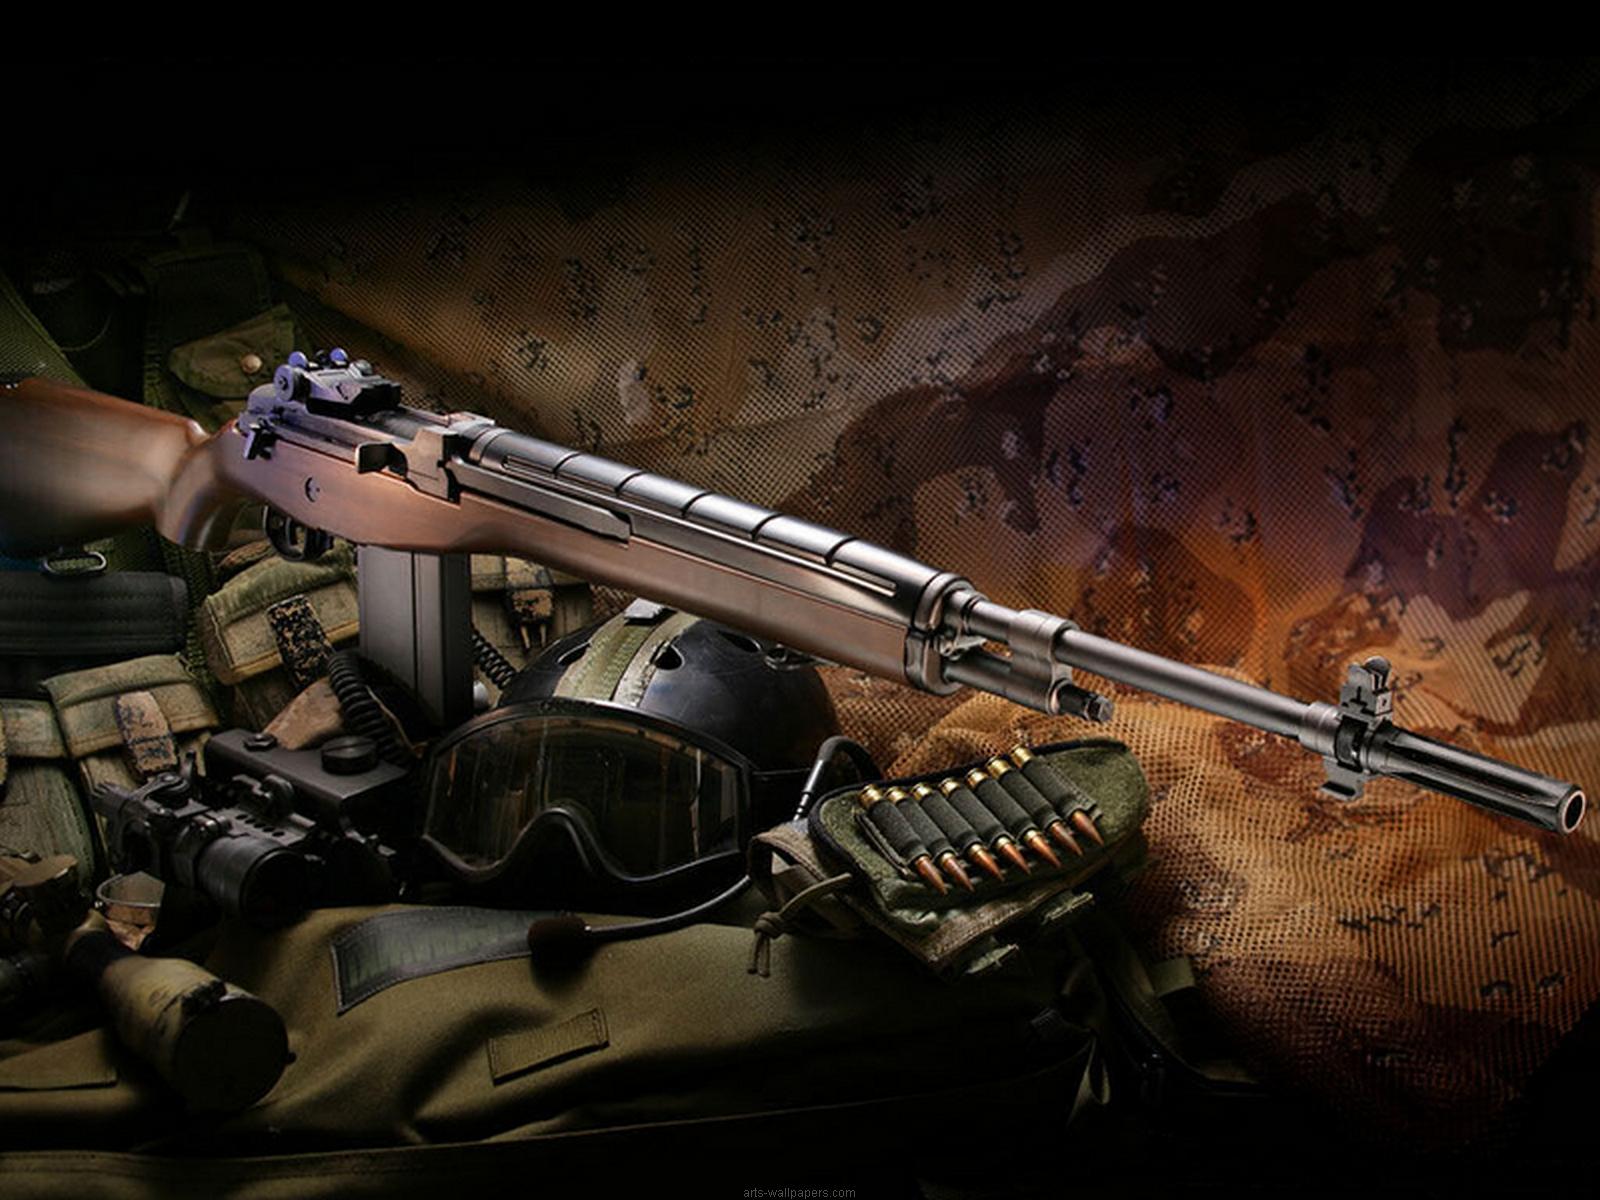 M-14 rifle wallpaper, скачать фото, М-14 винтовка, оружие, обои